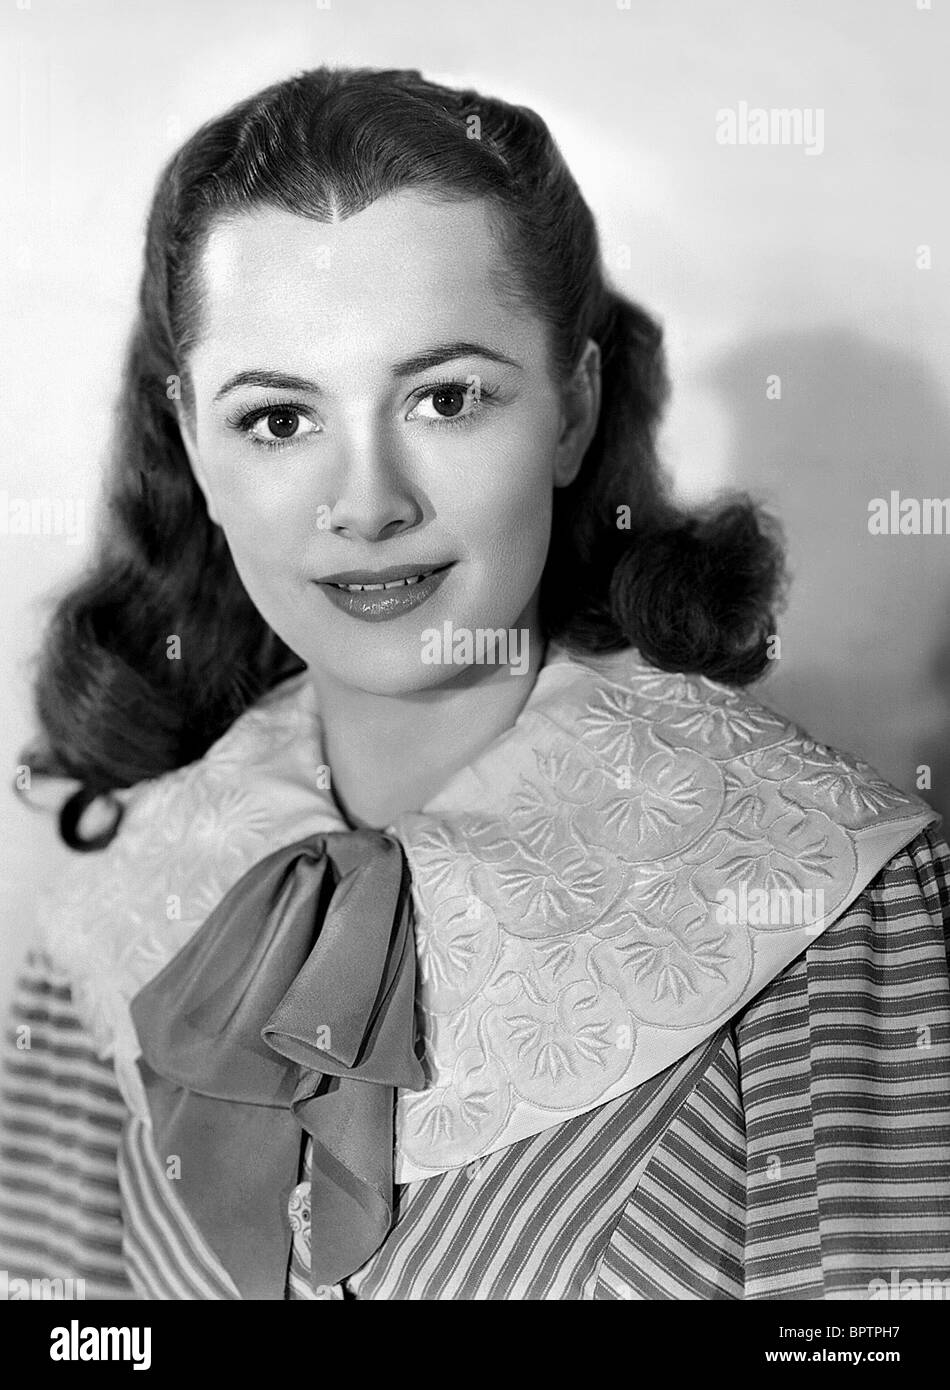 OLIVIA DE HAVILLAND ACTRESS (1946) - Stock Image